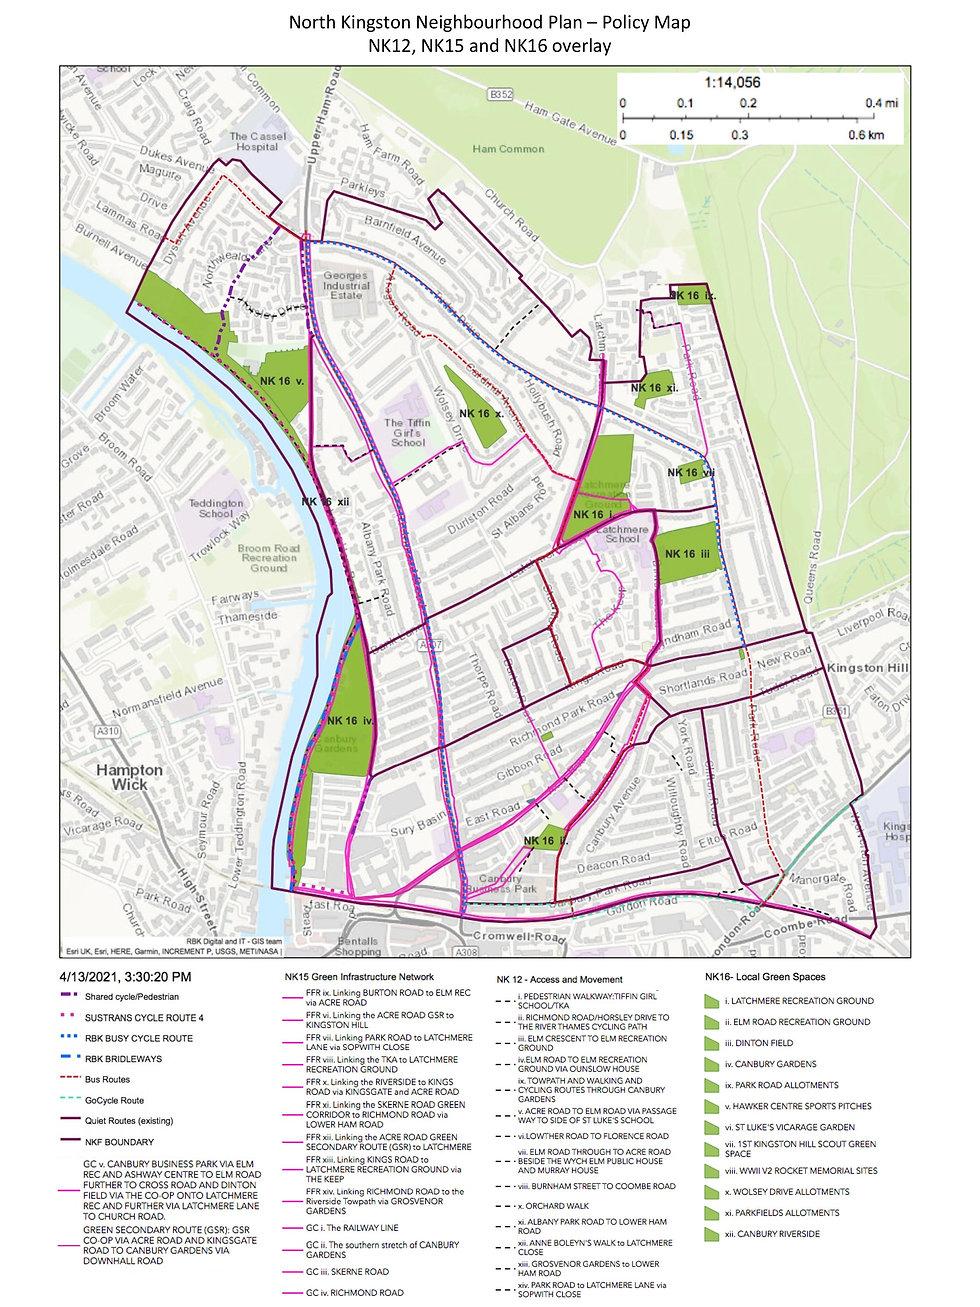 NKNPlan Policies Map NK12, NK15, NK16-pa